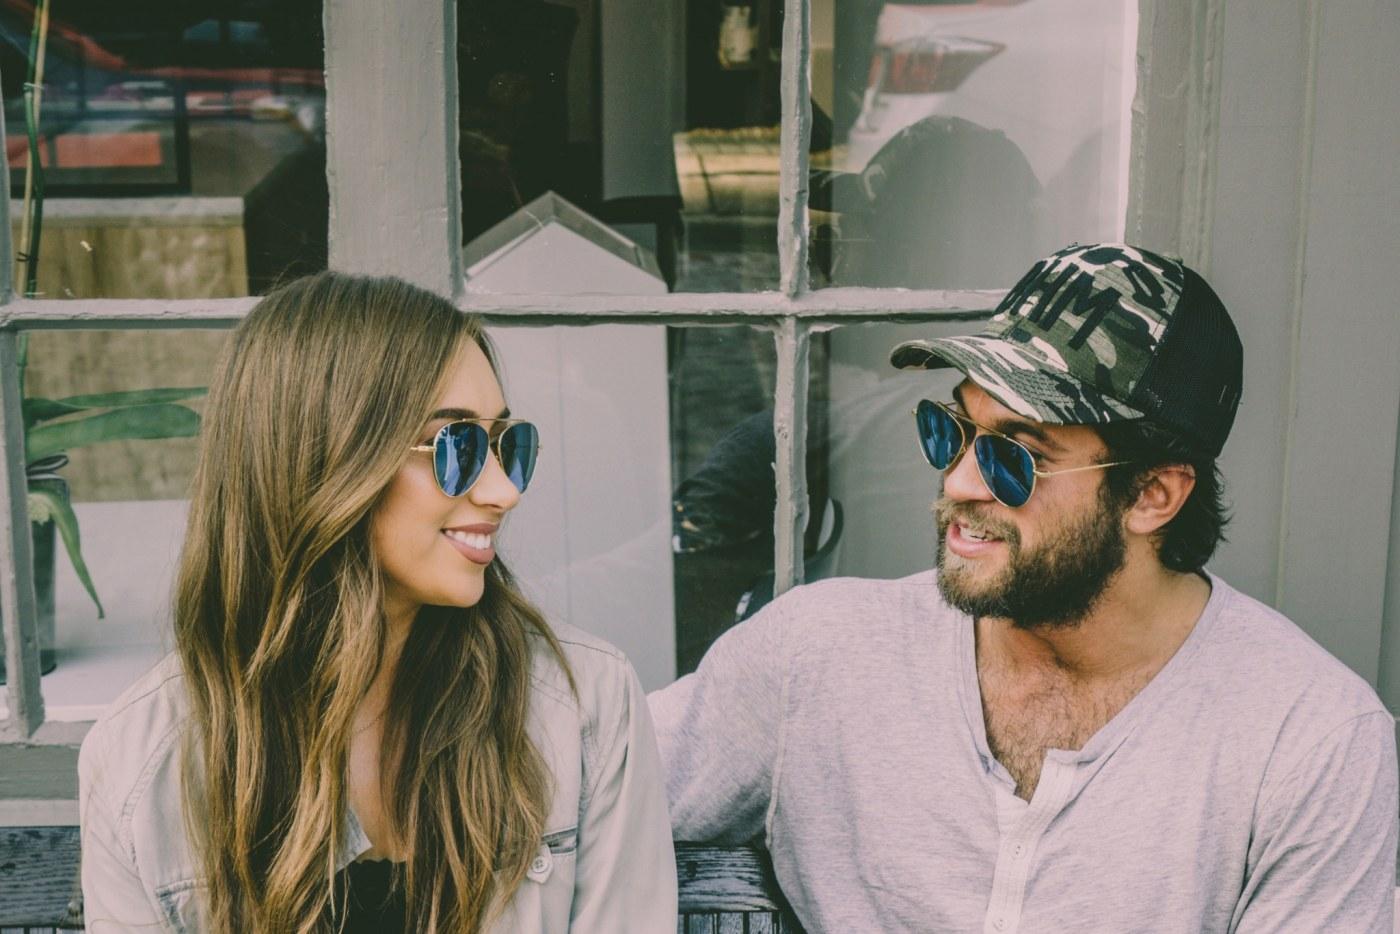 Birmingham, Alabama, Aviate Brand, 2018 Holiday Gift Guide, Maho Shades, sunglasses